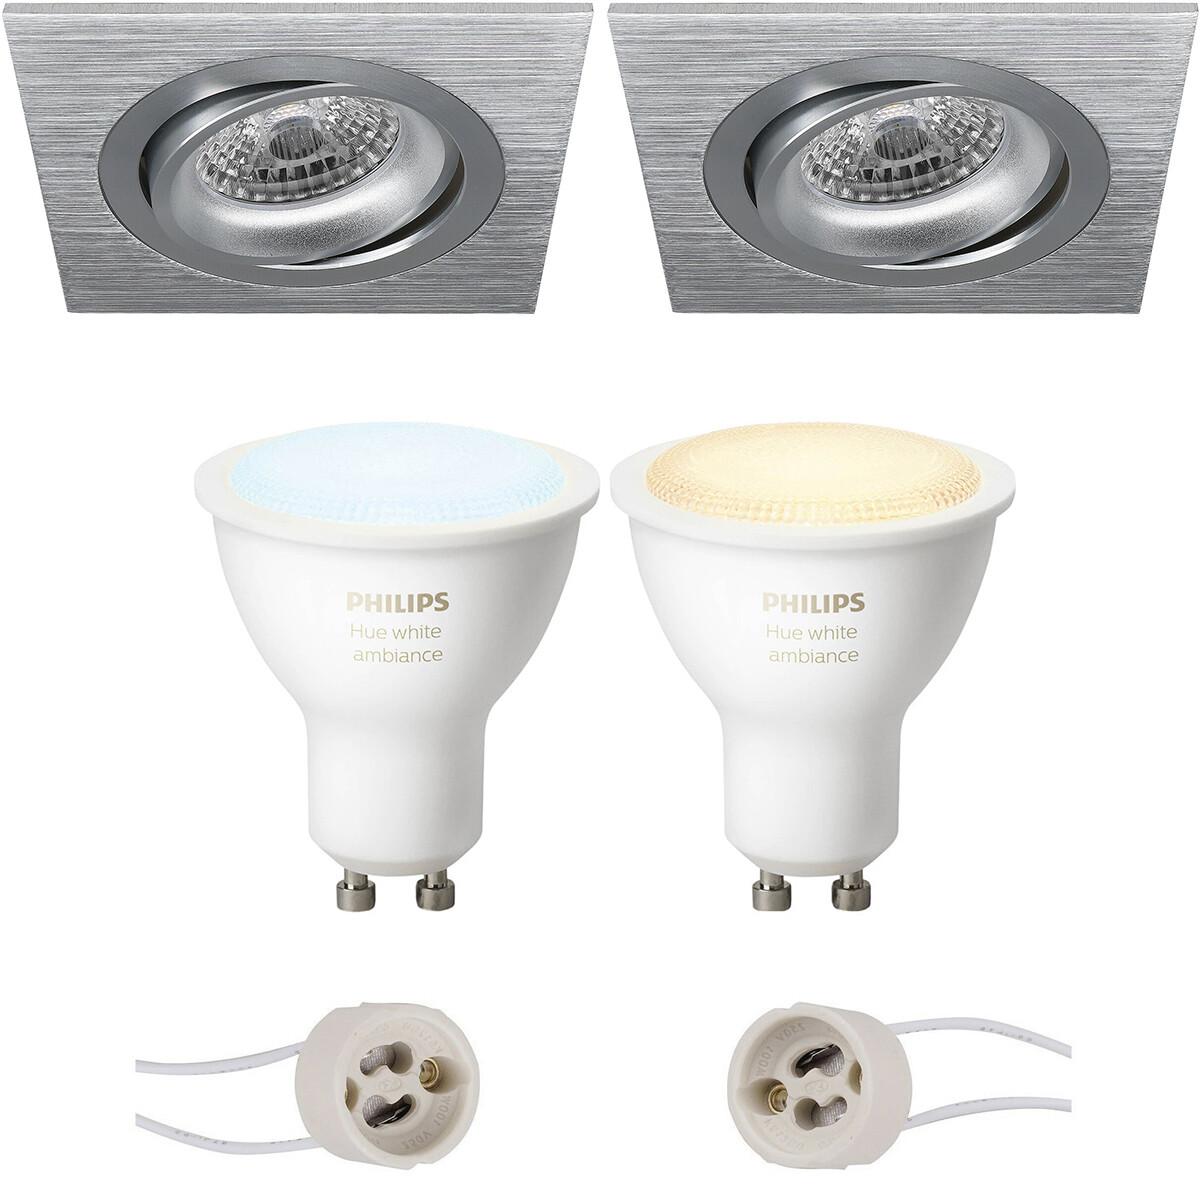 Pragmi Borny Pro - Inbouw Vierkant - Mat Zilver - Kantelbaar - 92mm - Philips Hue - LED Spot Set GU1